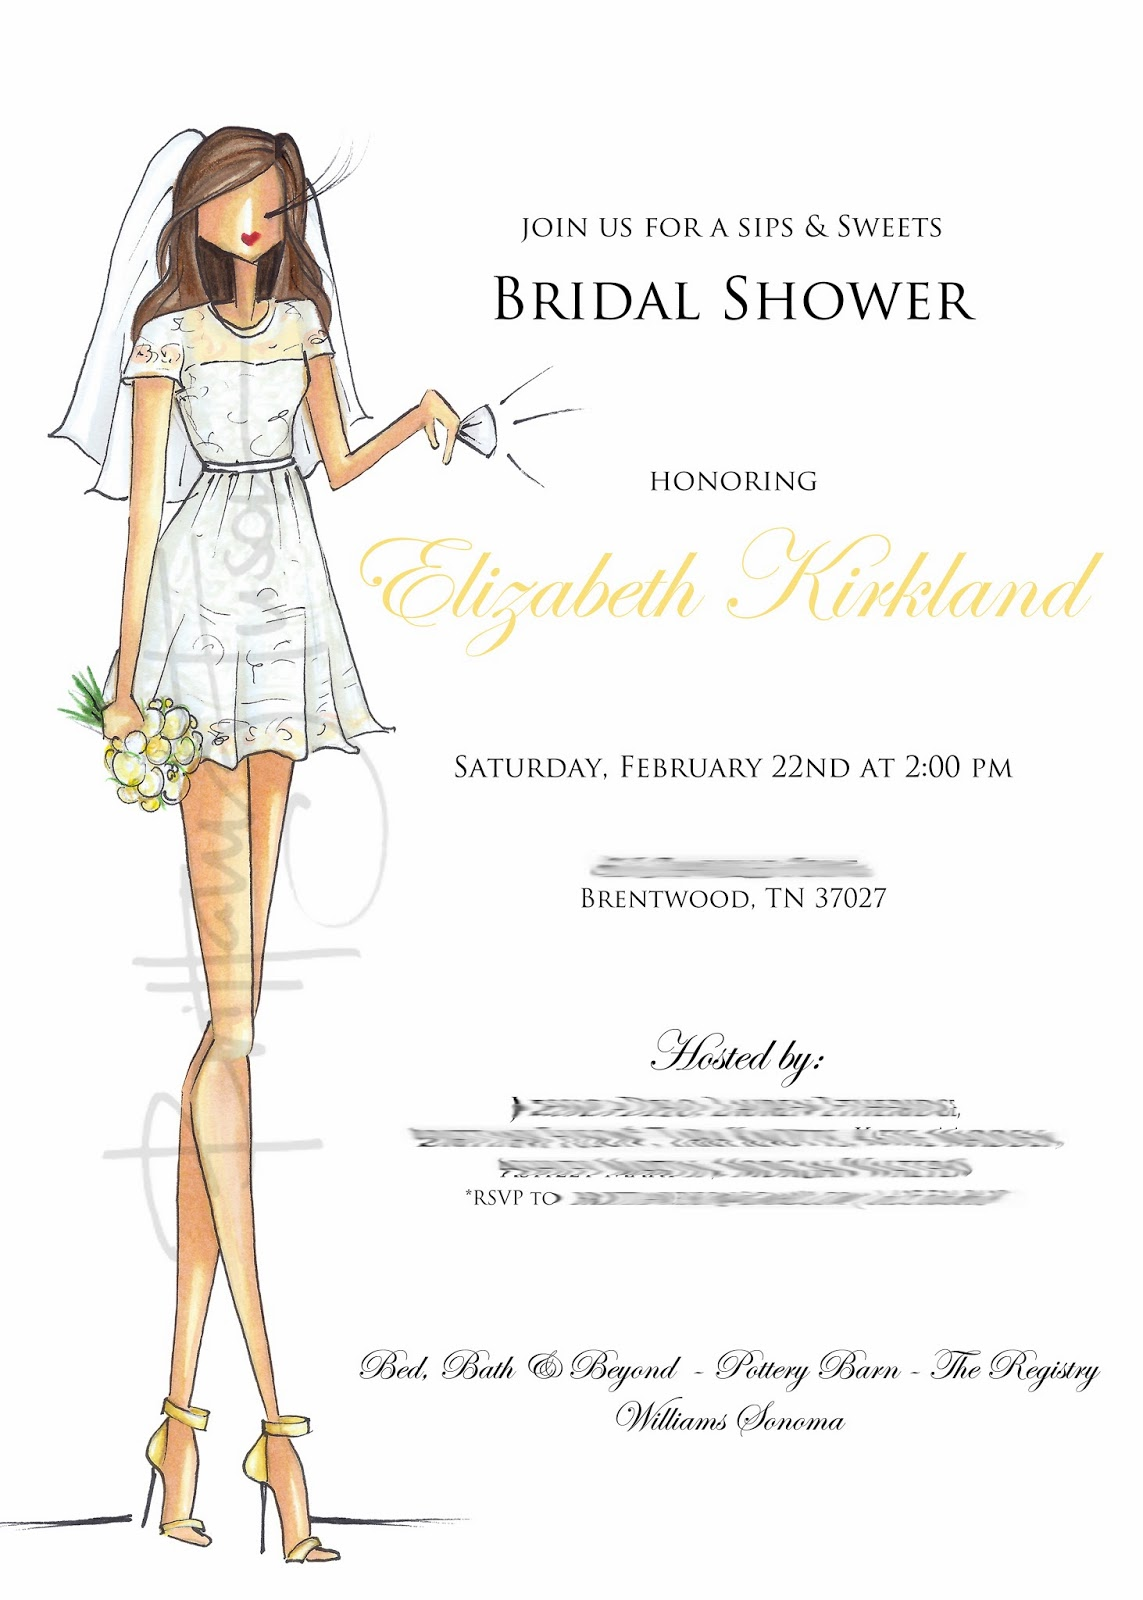 Brittany Fuson: Custom Bridal Shower Invitations